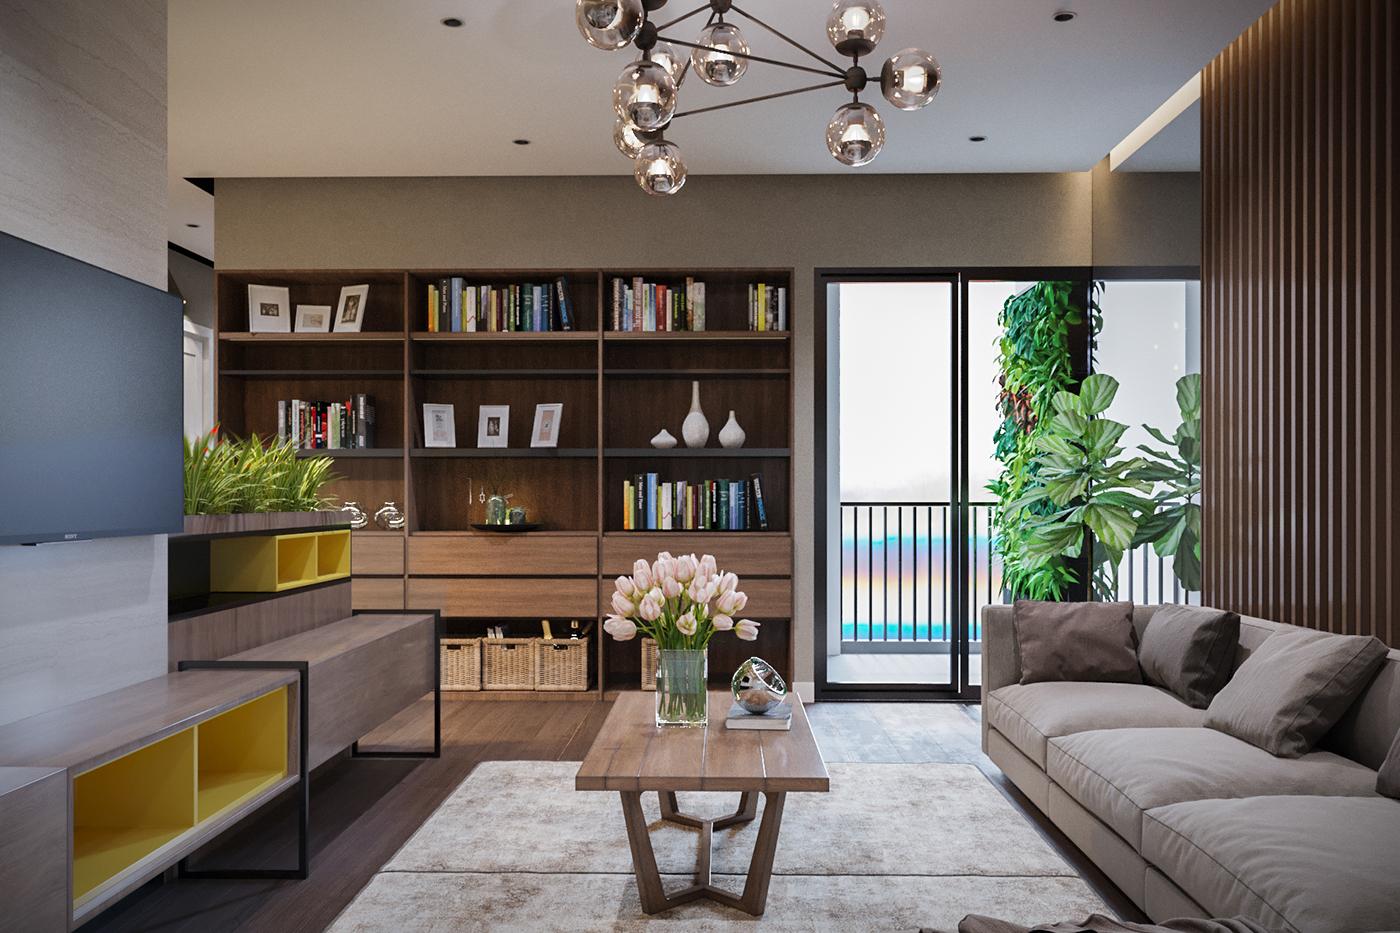 Japanese Style Apartment On Behance,300 Square Feet Apartment Floor Plan